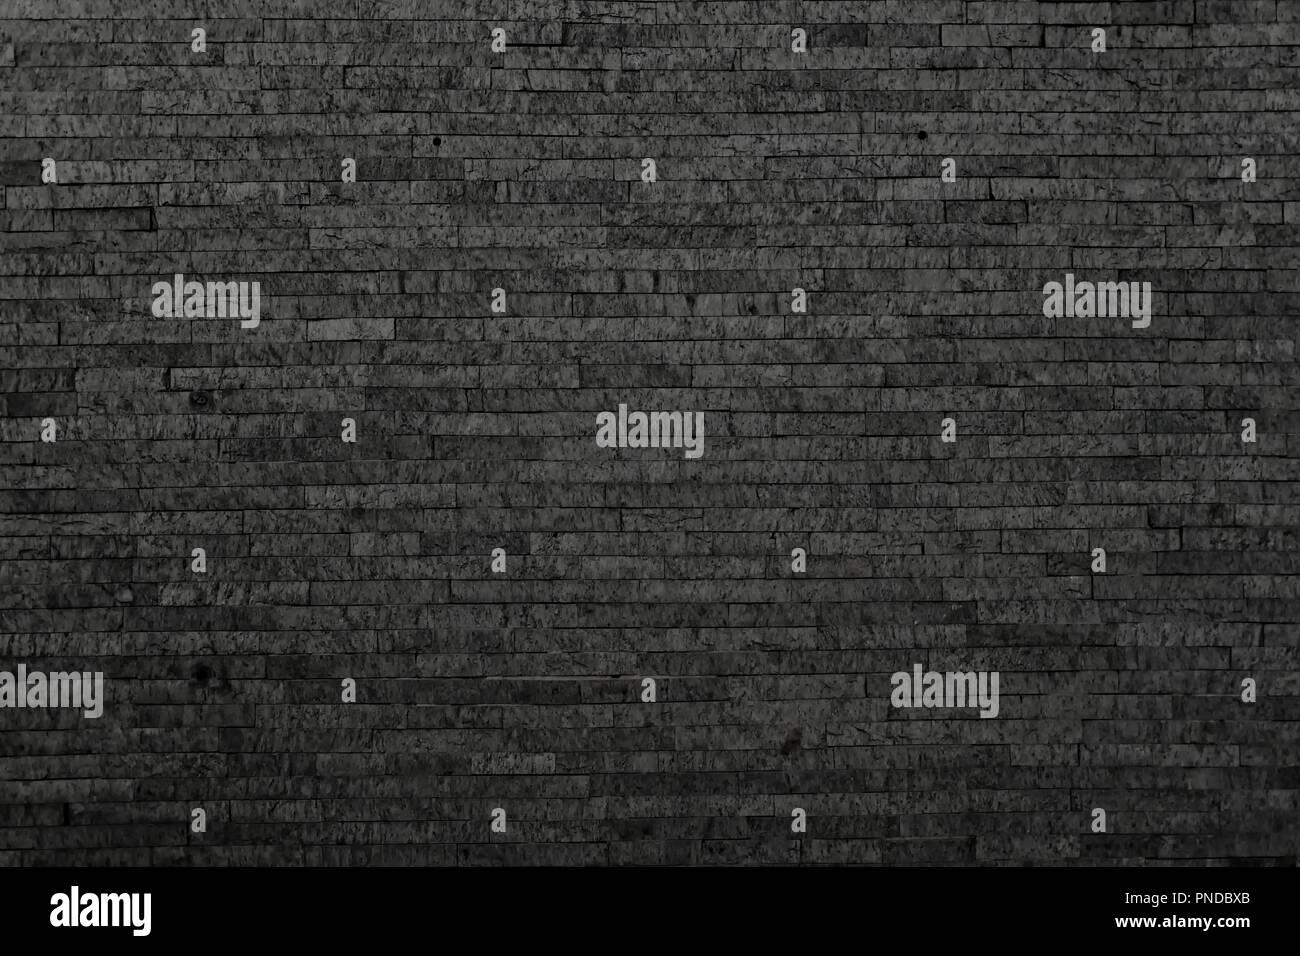 Black brick wall, brickwork background for design - Stock Image